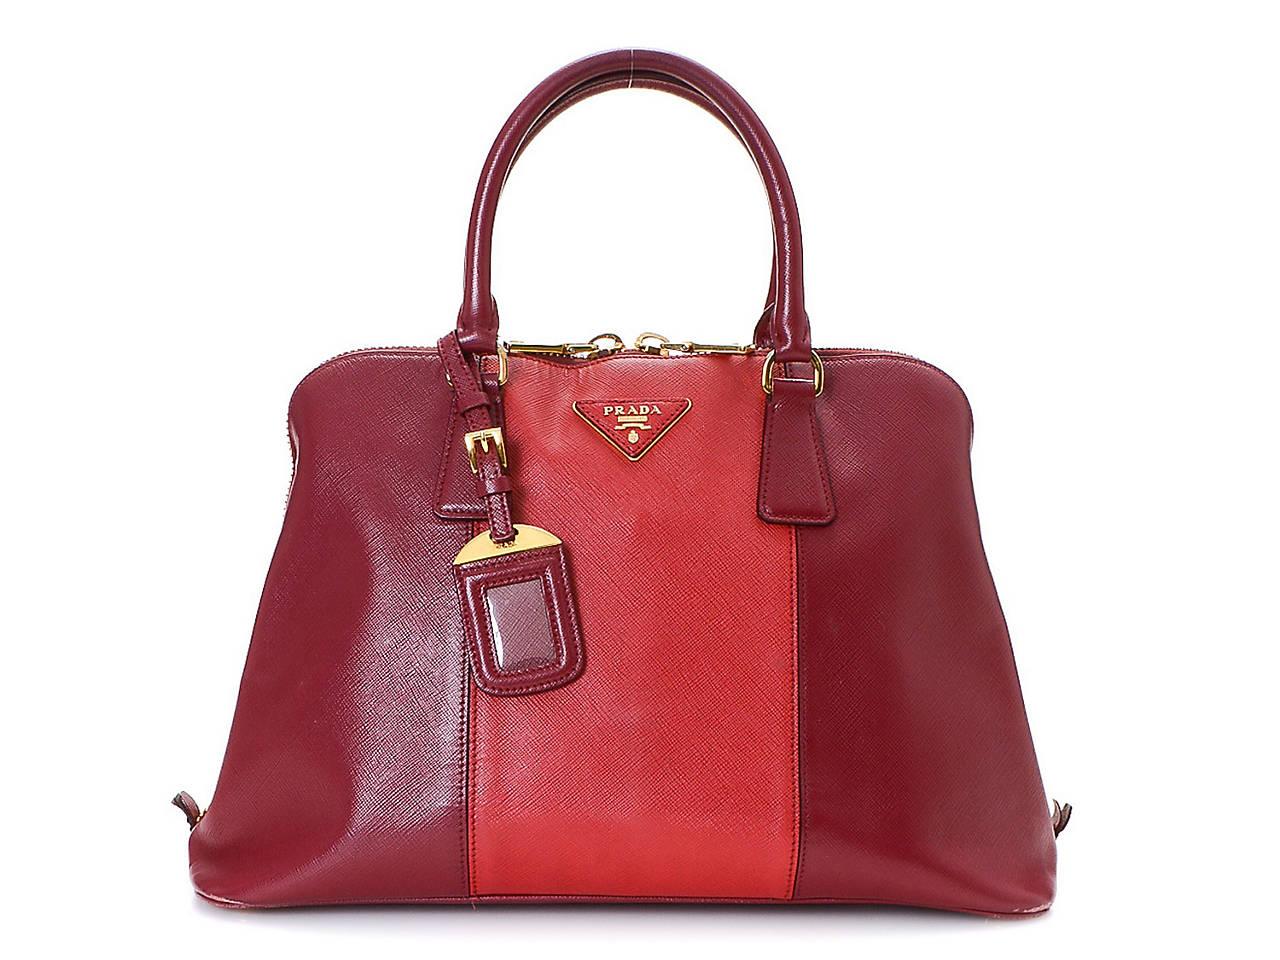 bc66b366a819 Prada - Vintage Luxury Saffiano Leather Shoulder Bag Women s ...